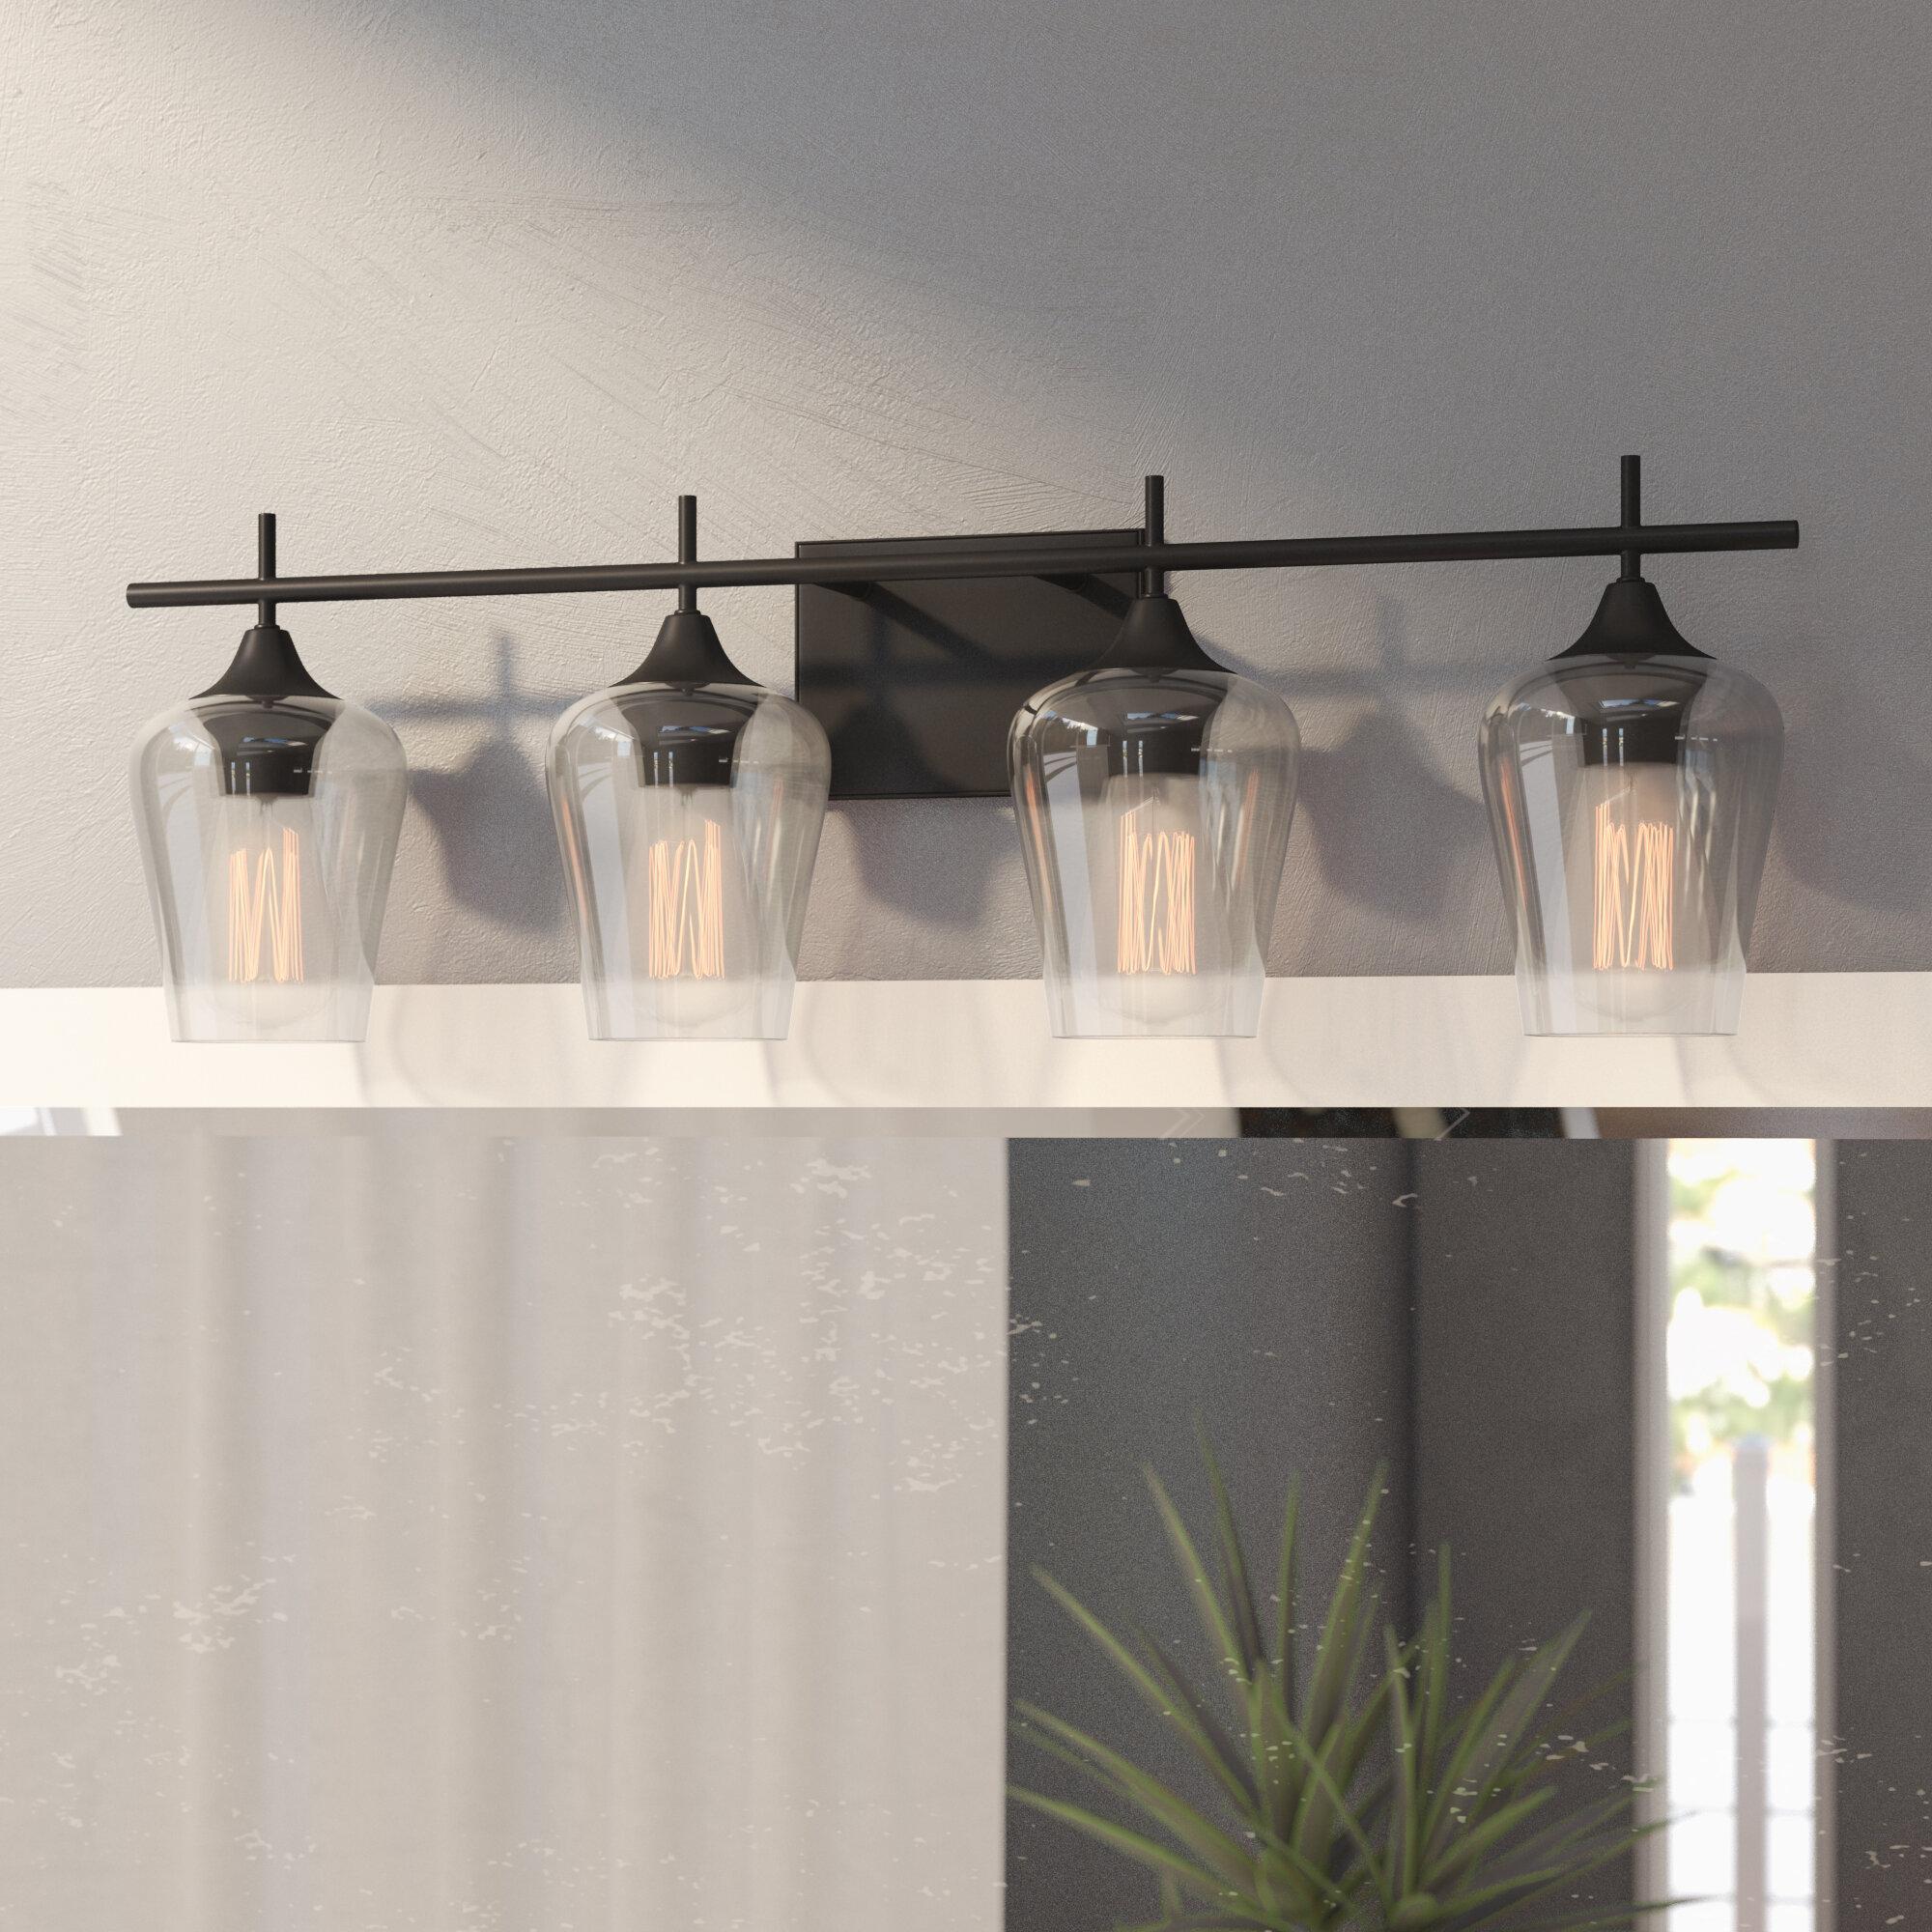 Hickerson 4 light vanity light